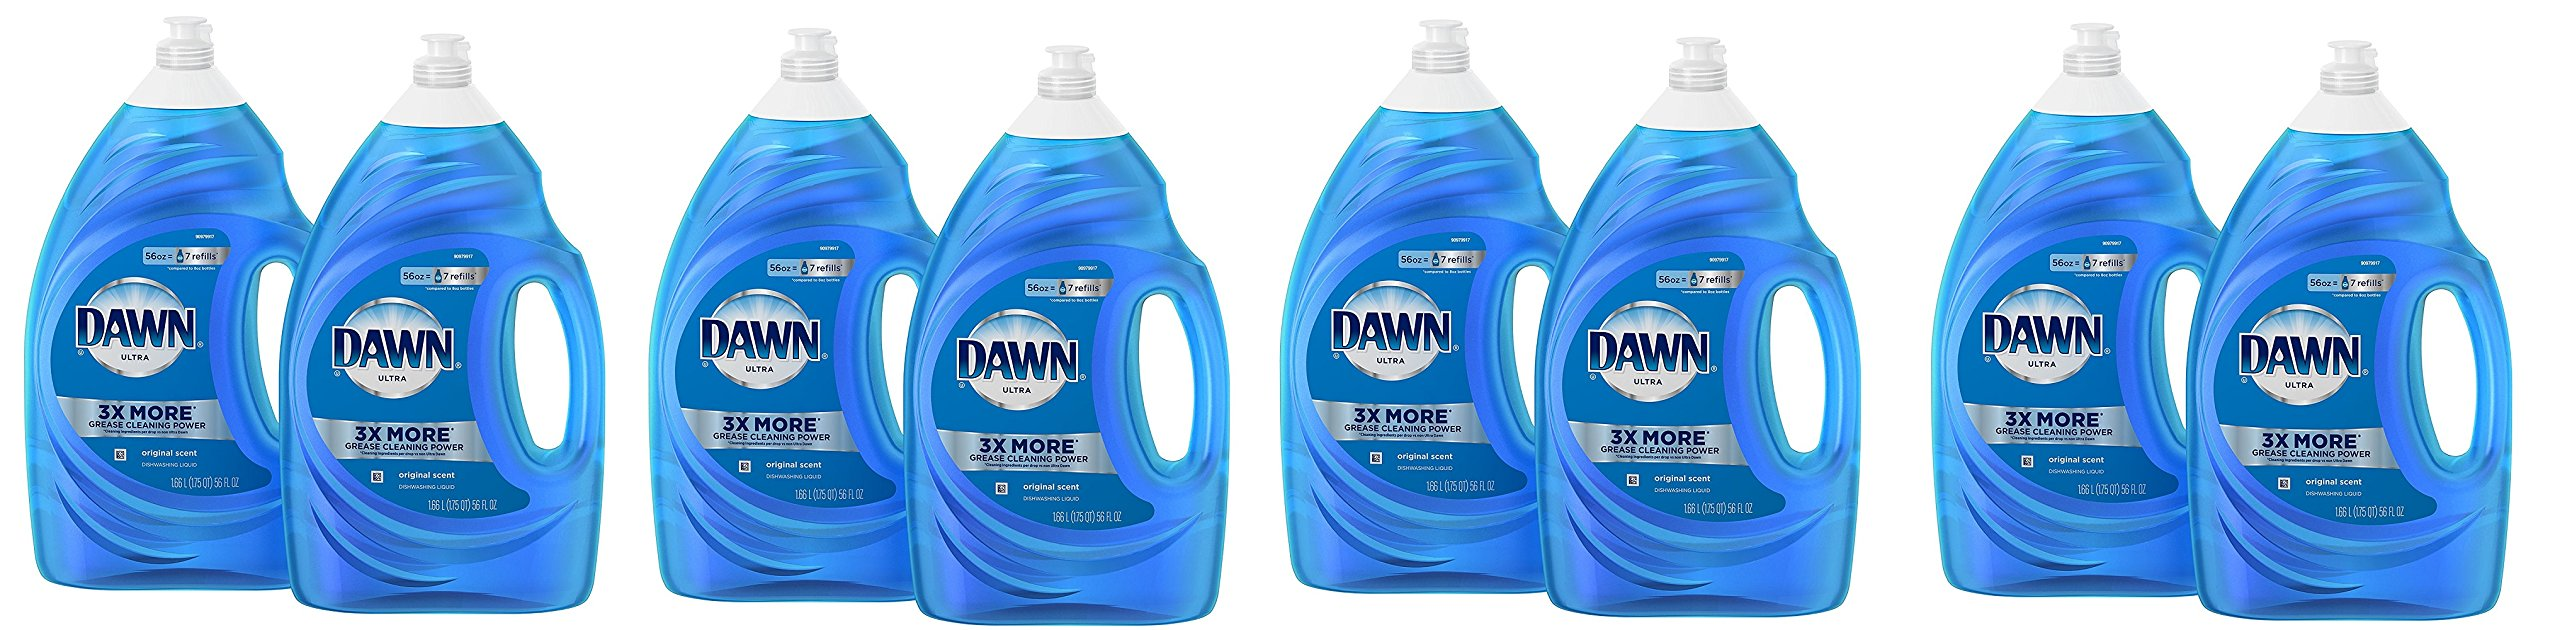 Dawn Ultra Dishwashing Liquid Dish Soap DdKDpX, Original Scent, 8 Count (56 Ounce)